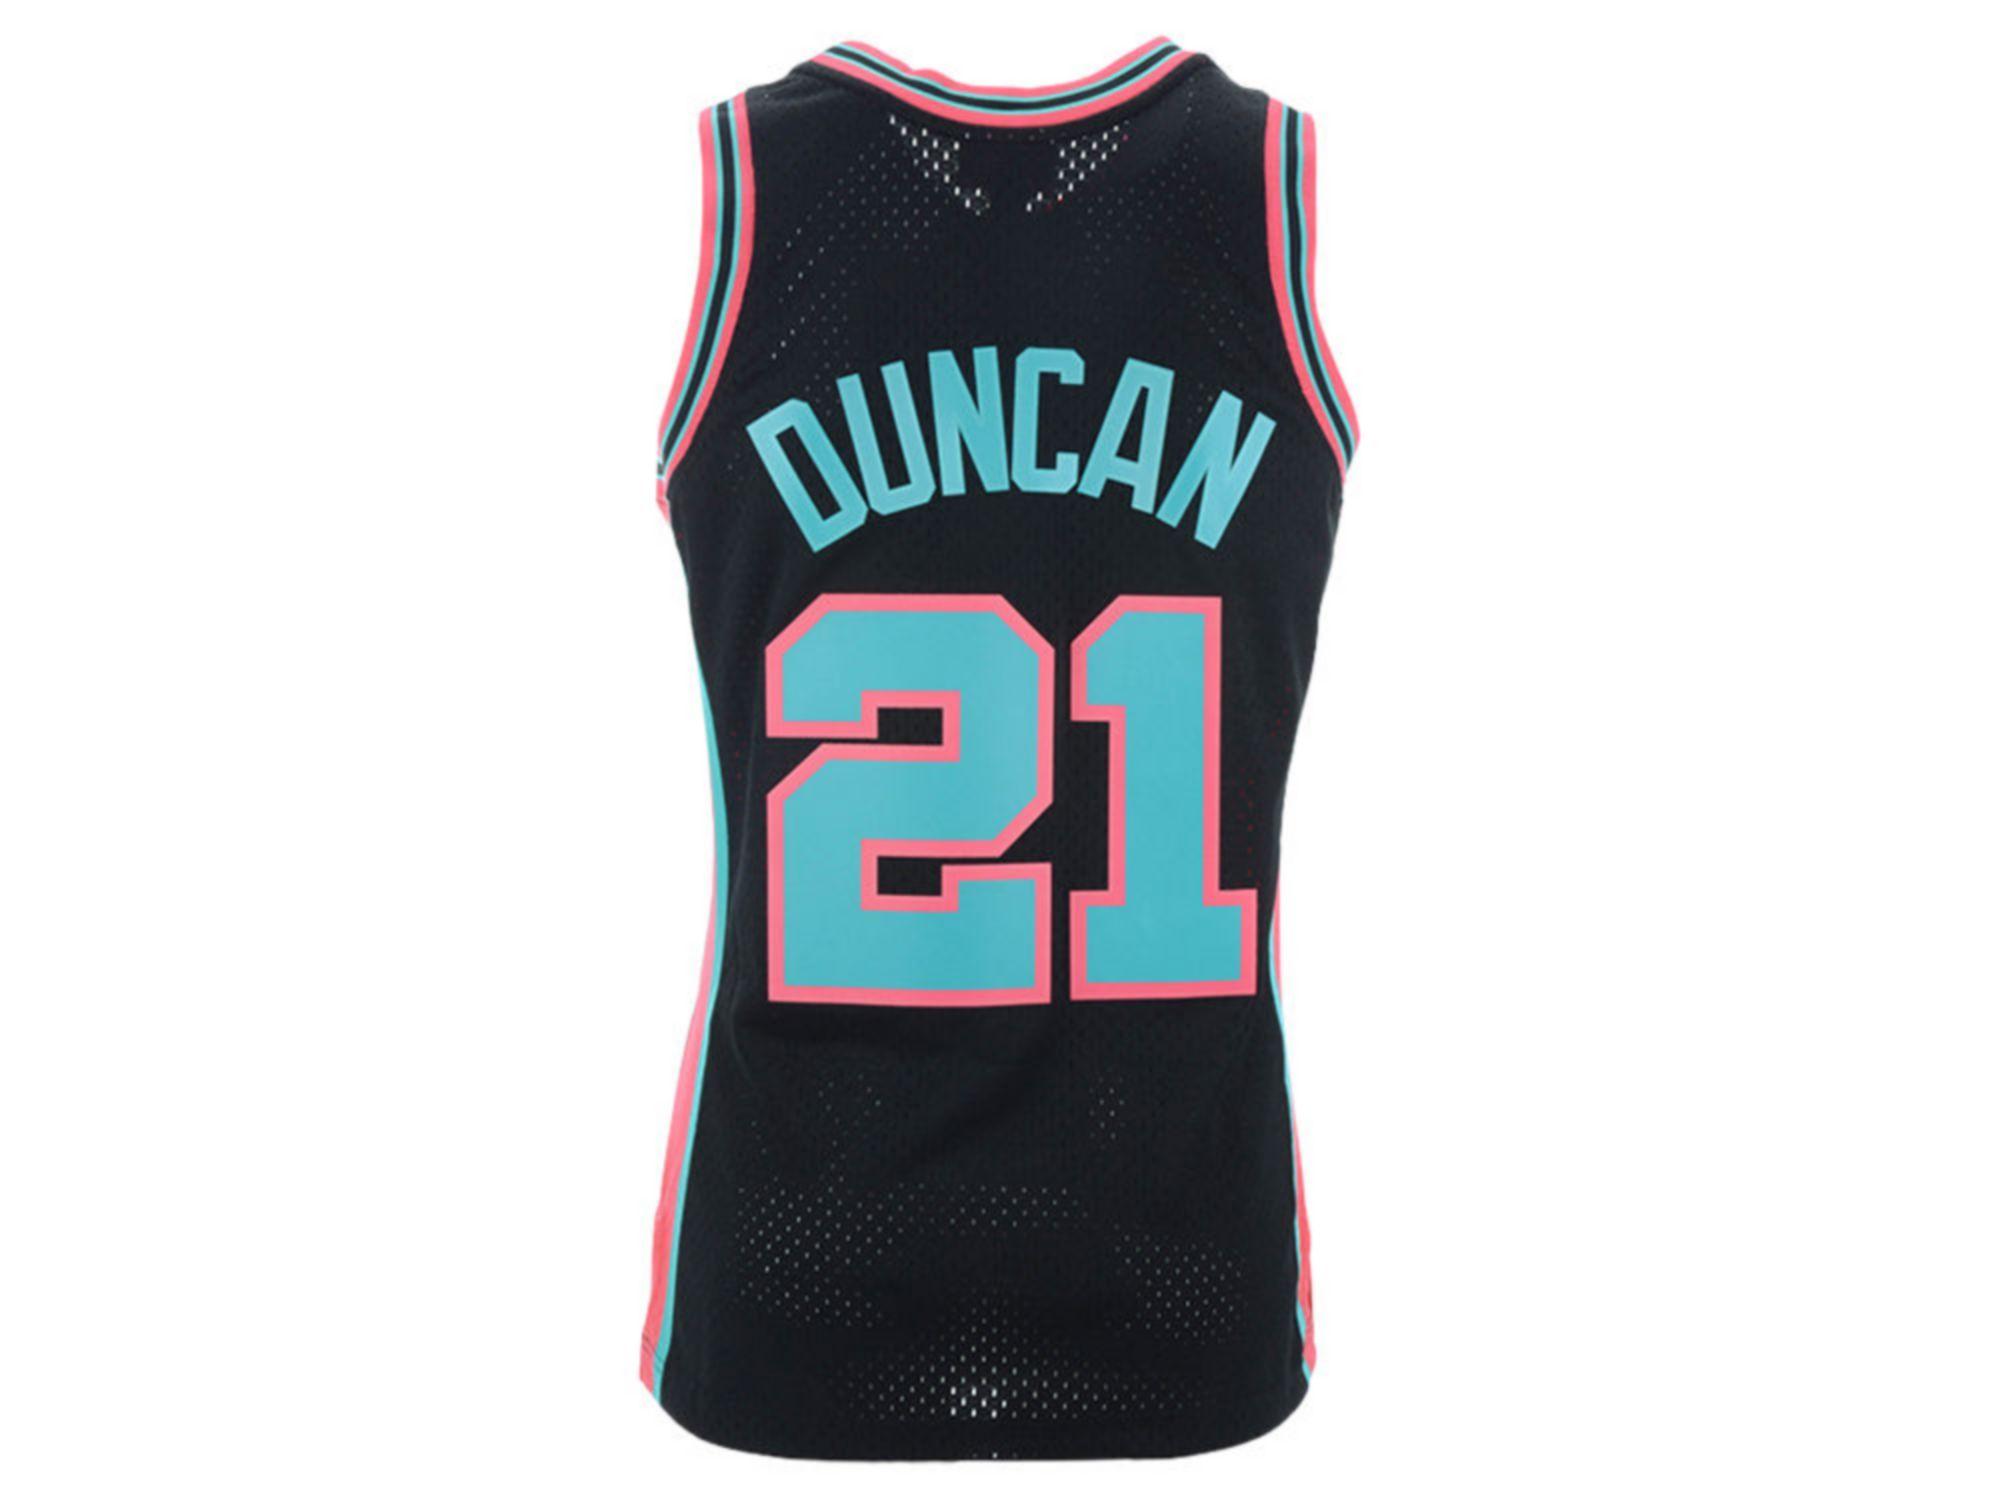 Mitchell & Ness Men's San Antonio Spurs Reload Collection Swingman Jersey - Tim Duncan & Reviews - Sports Fan Shop By Lids - Men - Macy's